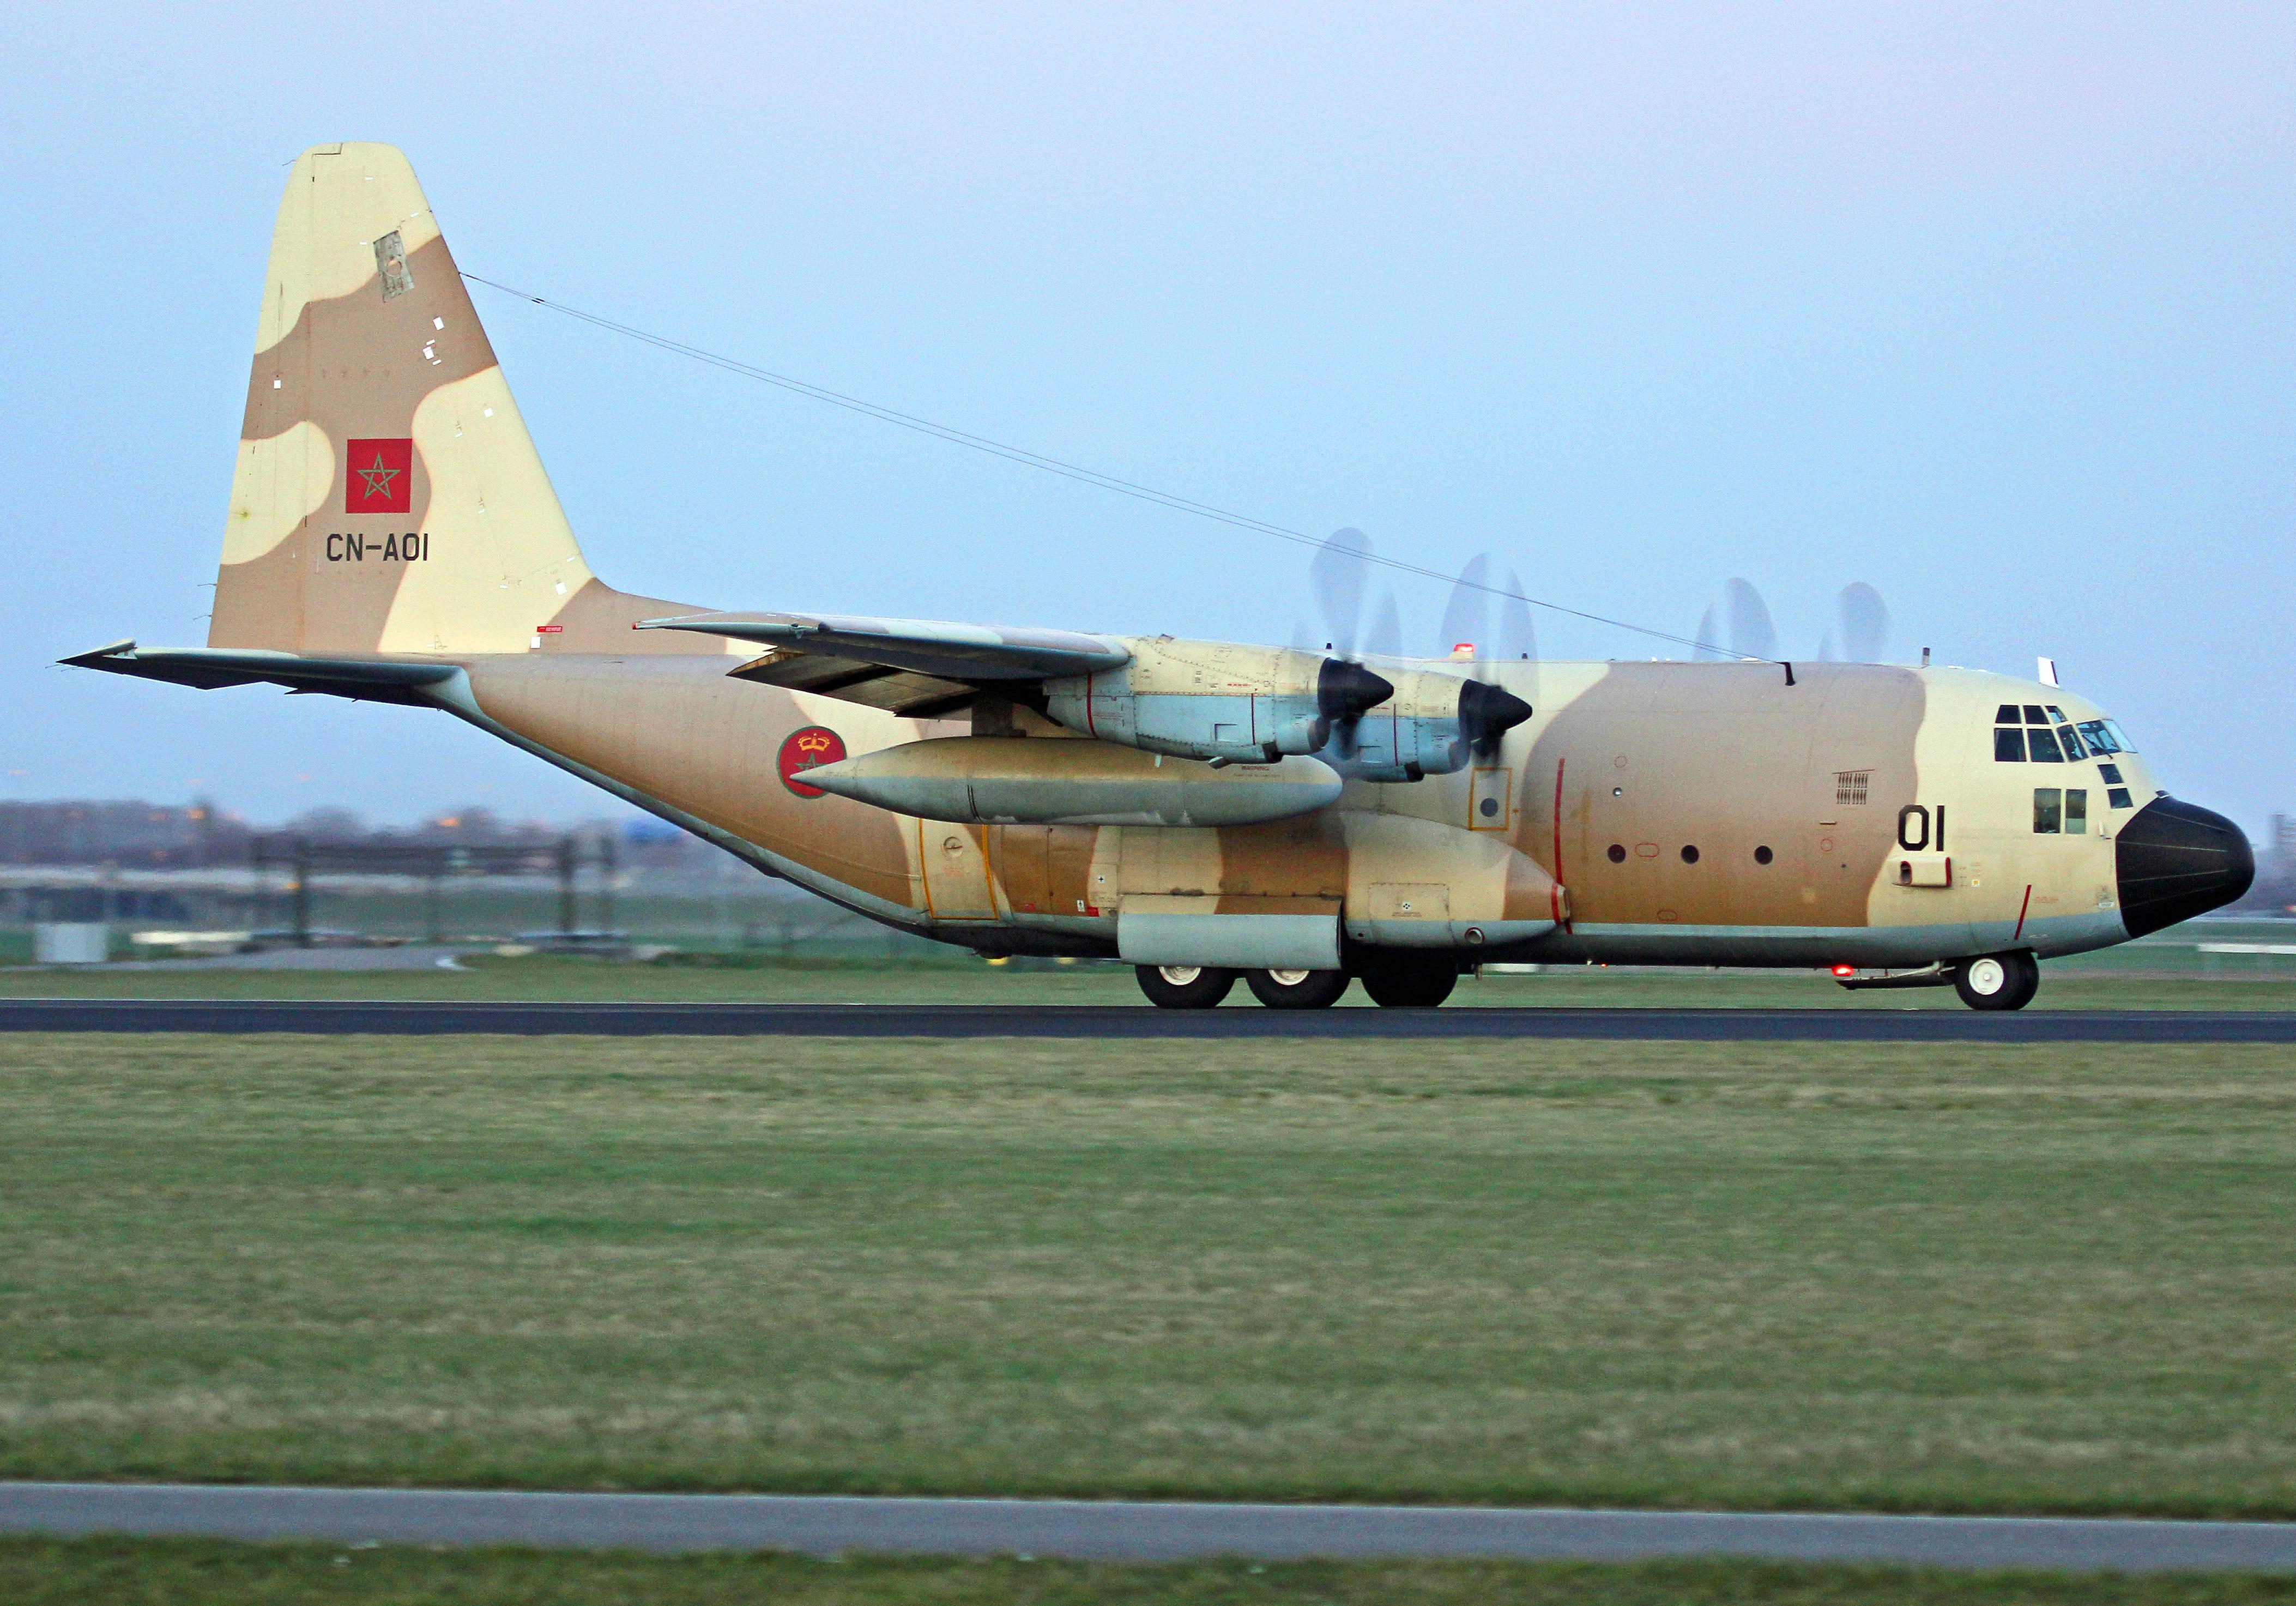 FRA: Photos d'avions de transport - Page 27 25497737543_180eb4a88d_o